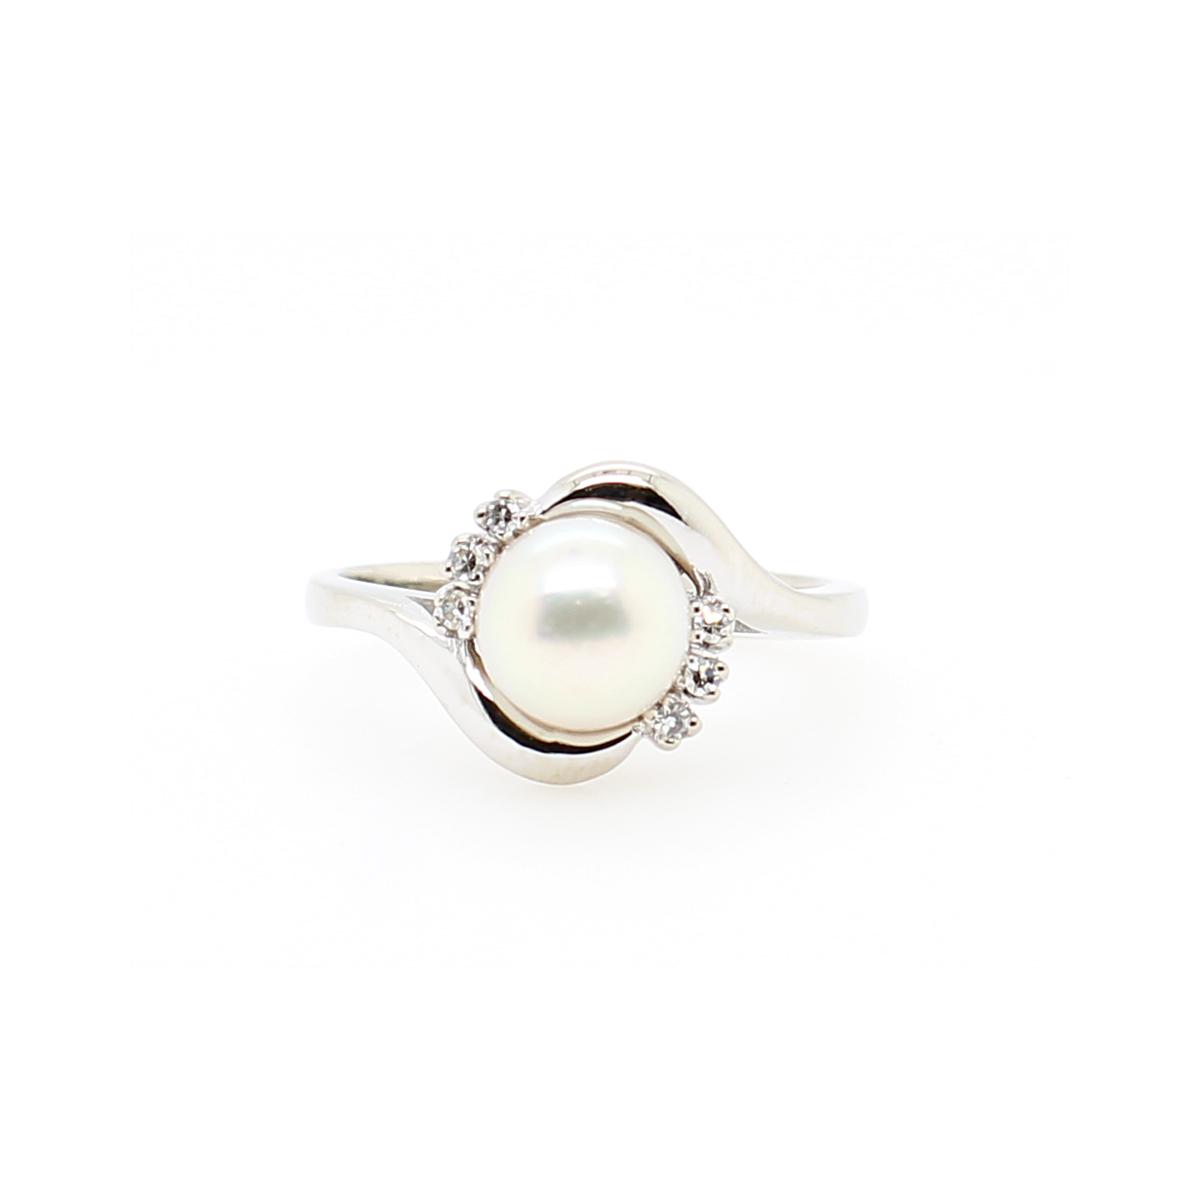 Vintage 14 Karat White Gold Akoya Pearl and Diamond Ring